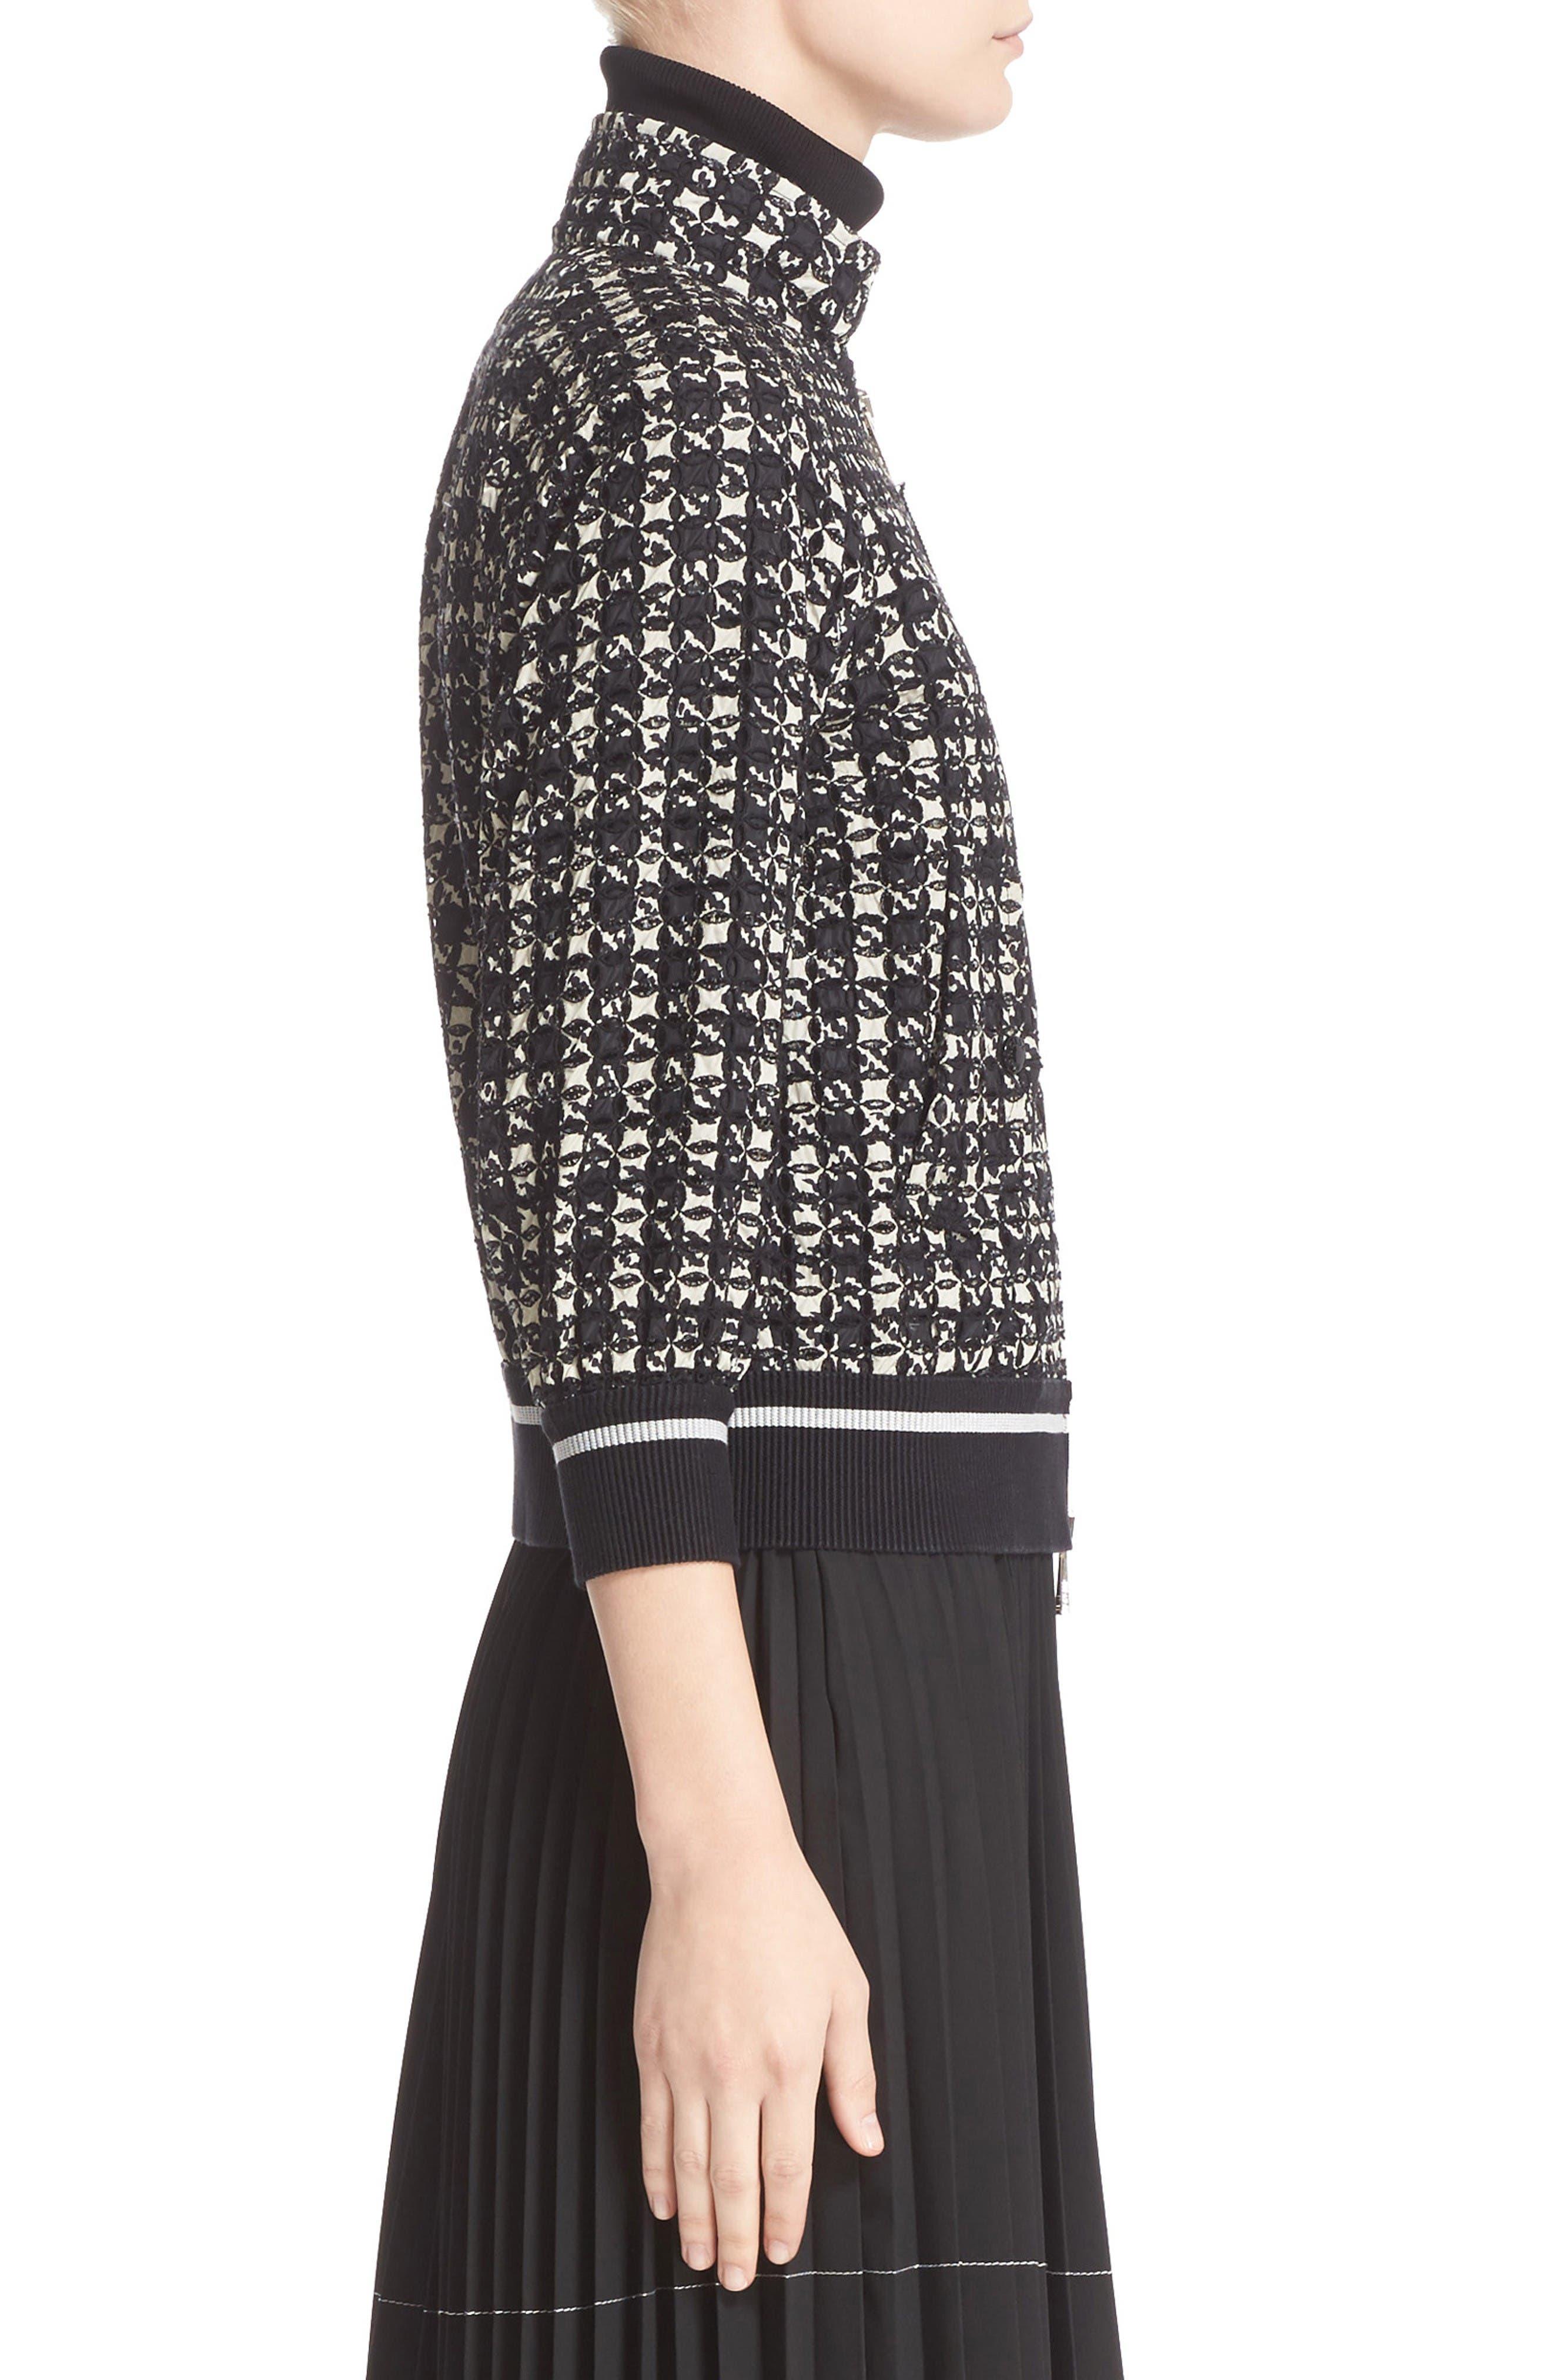 Fiadone Tweed Print Jacket,                             Alternate thumbnail 4, color,                             Black